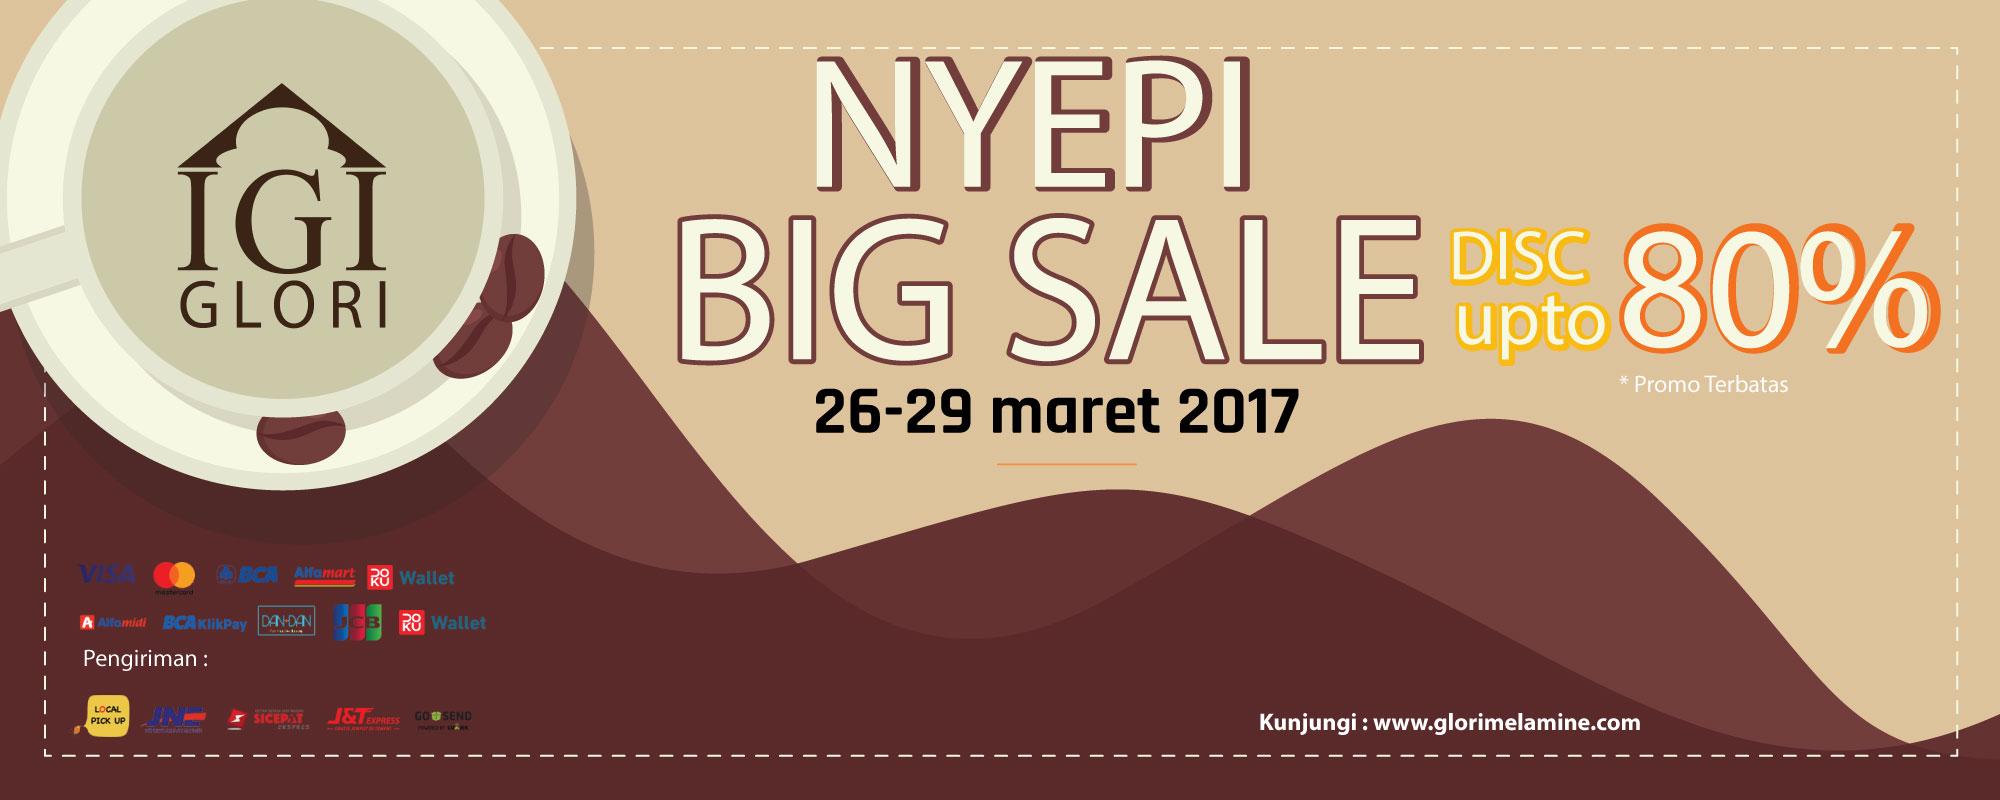 Promo Hari Raya Nyepi 2017 GLori Melamine, Diskon & Voucher Belanja Hemat